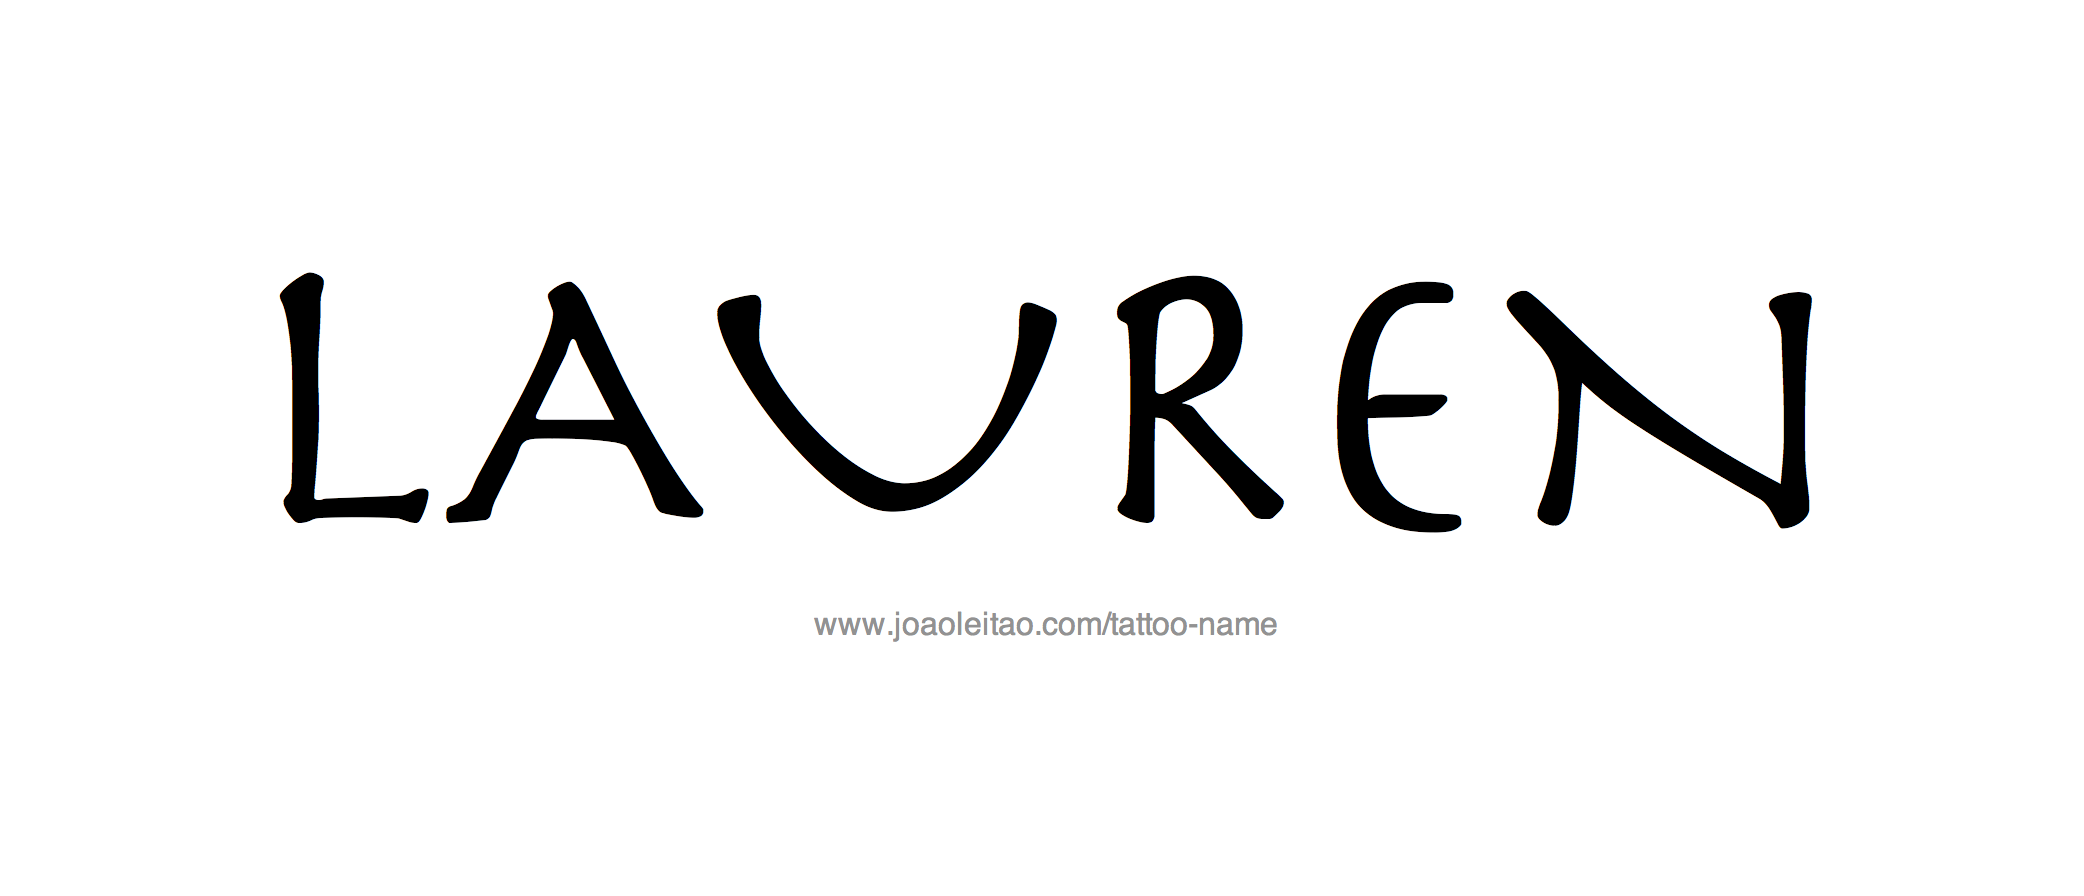 Lauren Name Tattoo Designs Name Tattoo Designs Tattoo Designs Name Tattoos